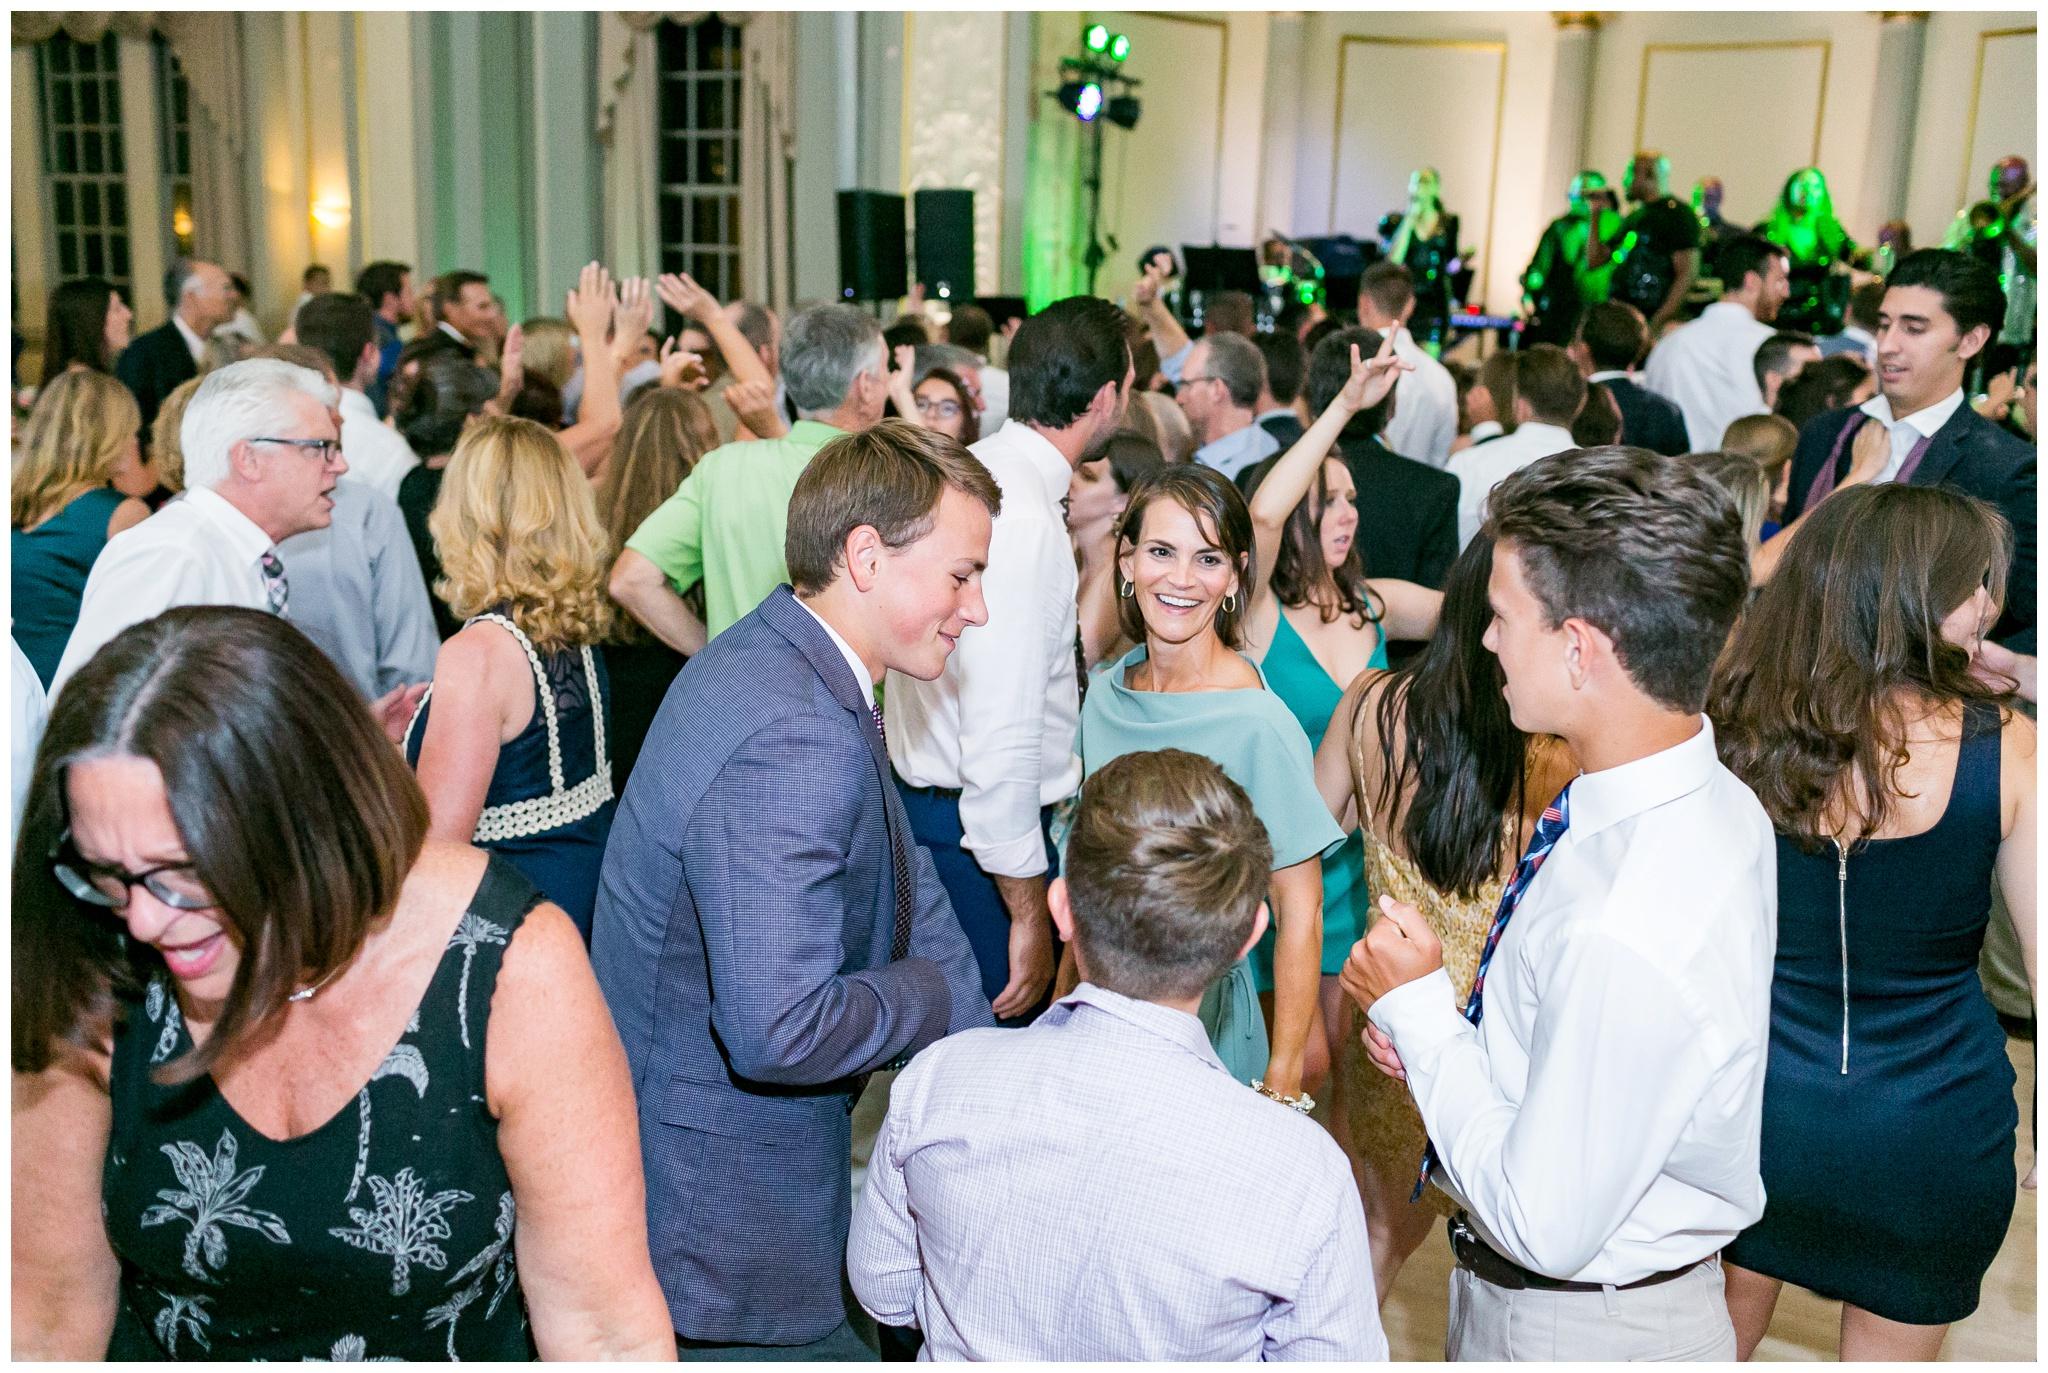 UW_Memorial_Union_wedding_madison_wisconsin_wedding_photographers_4651.jpg